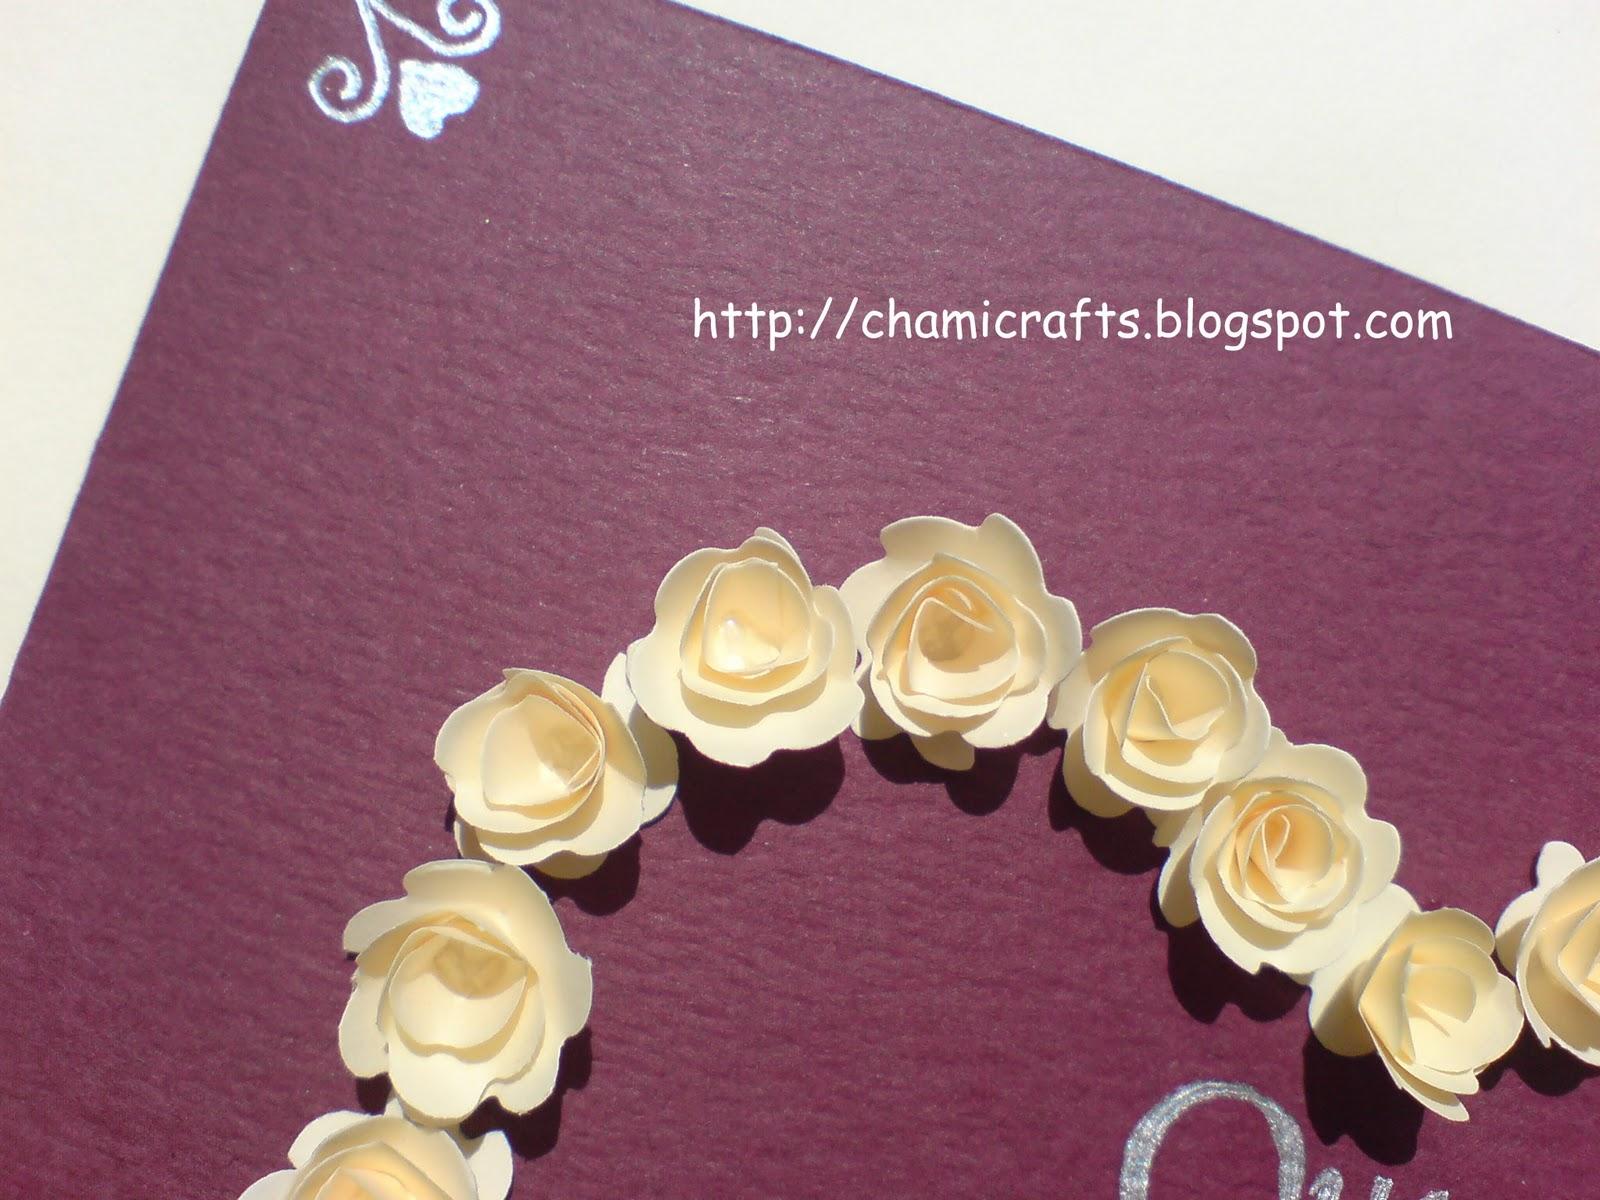 Chami crafts handmade greeting cards anniversary card